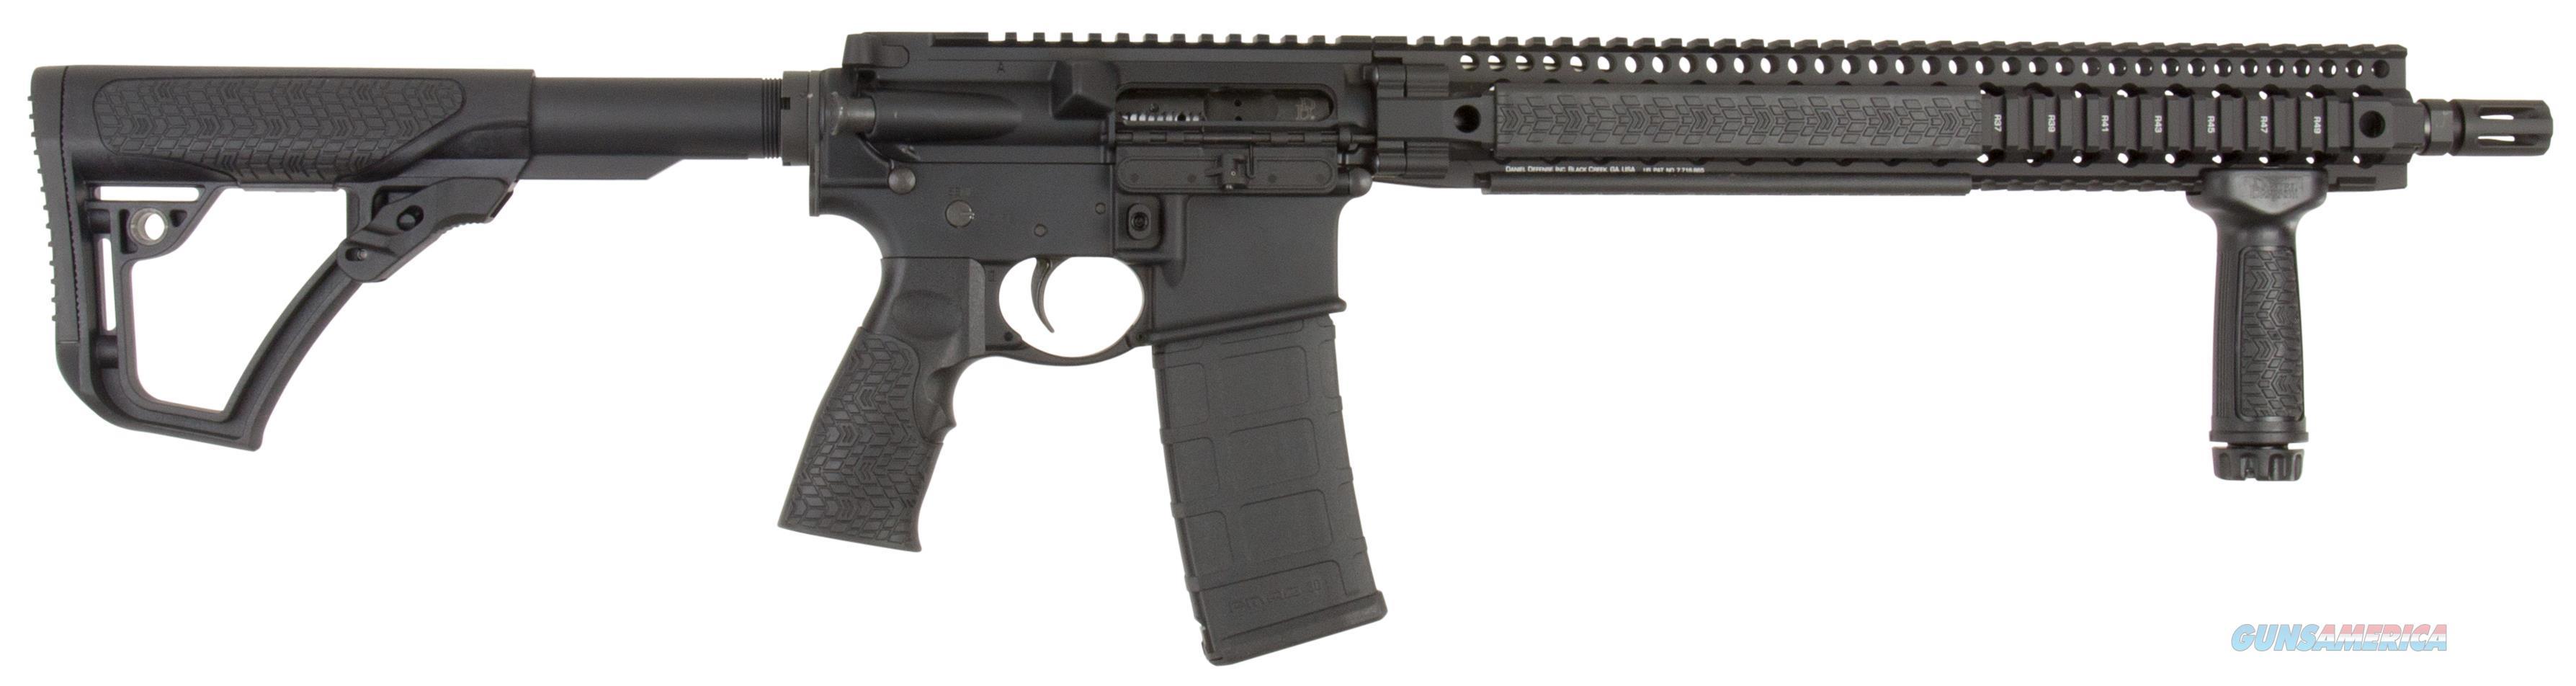 "Daniel Defense 15175055 Ddm4 V9 *Ca Compliant* Semi-Automatic 223 Remington/5.56 Nato 16"" 10+1 6-Position Black Stk Black Hard Coat Anodized/Black Phosphate 02-145-15175-055  Guns > Rifles > D Misc Rifles"